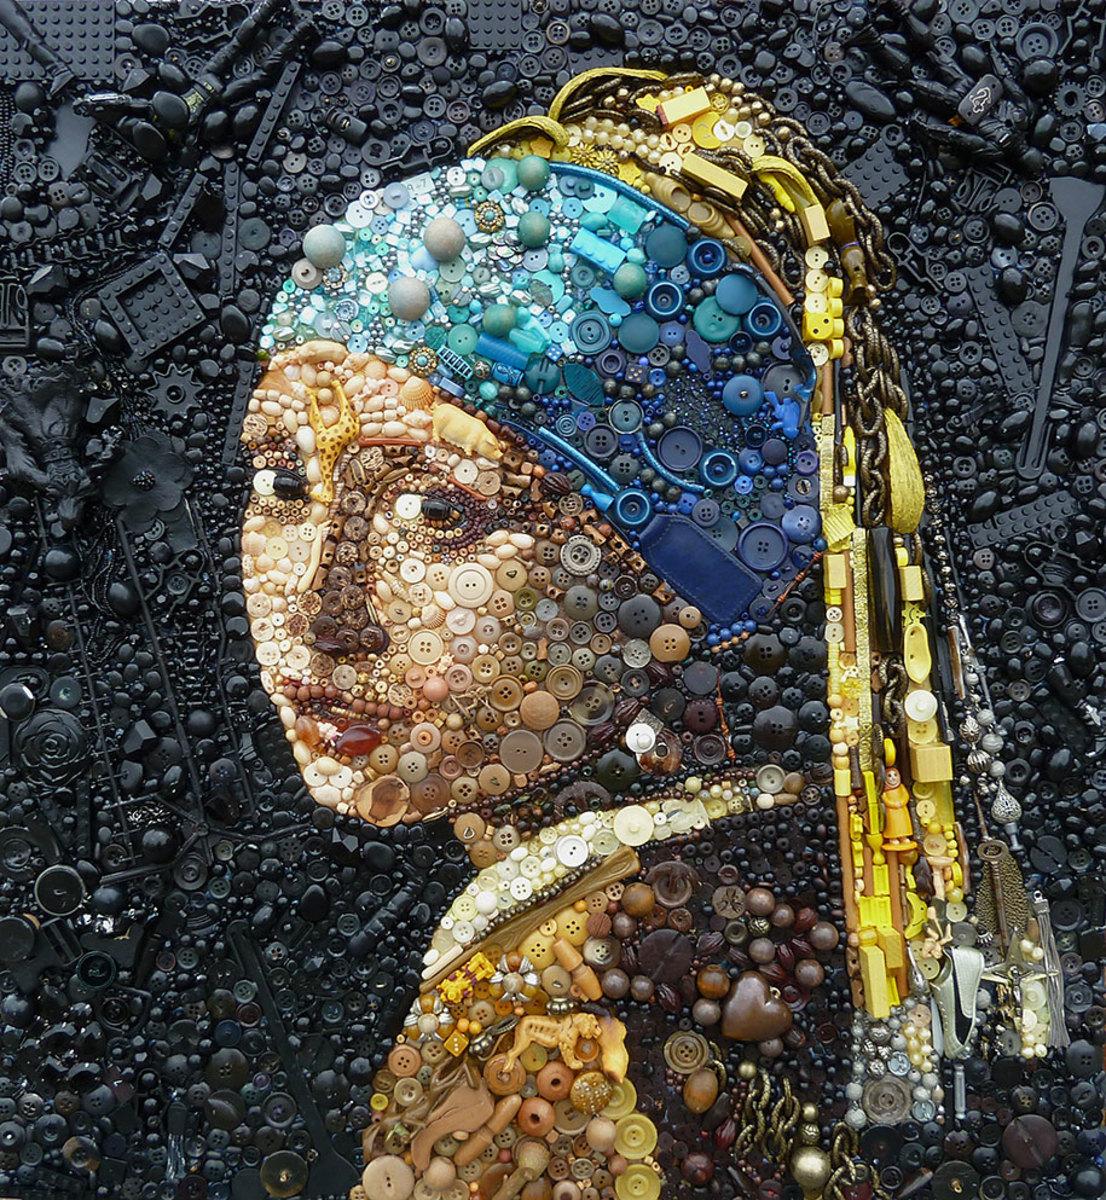 plastic-classics-found-objects-famous-portraits-jane-perkins-5